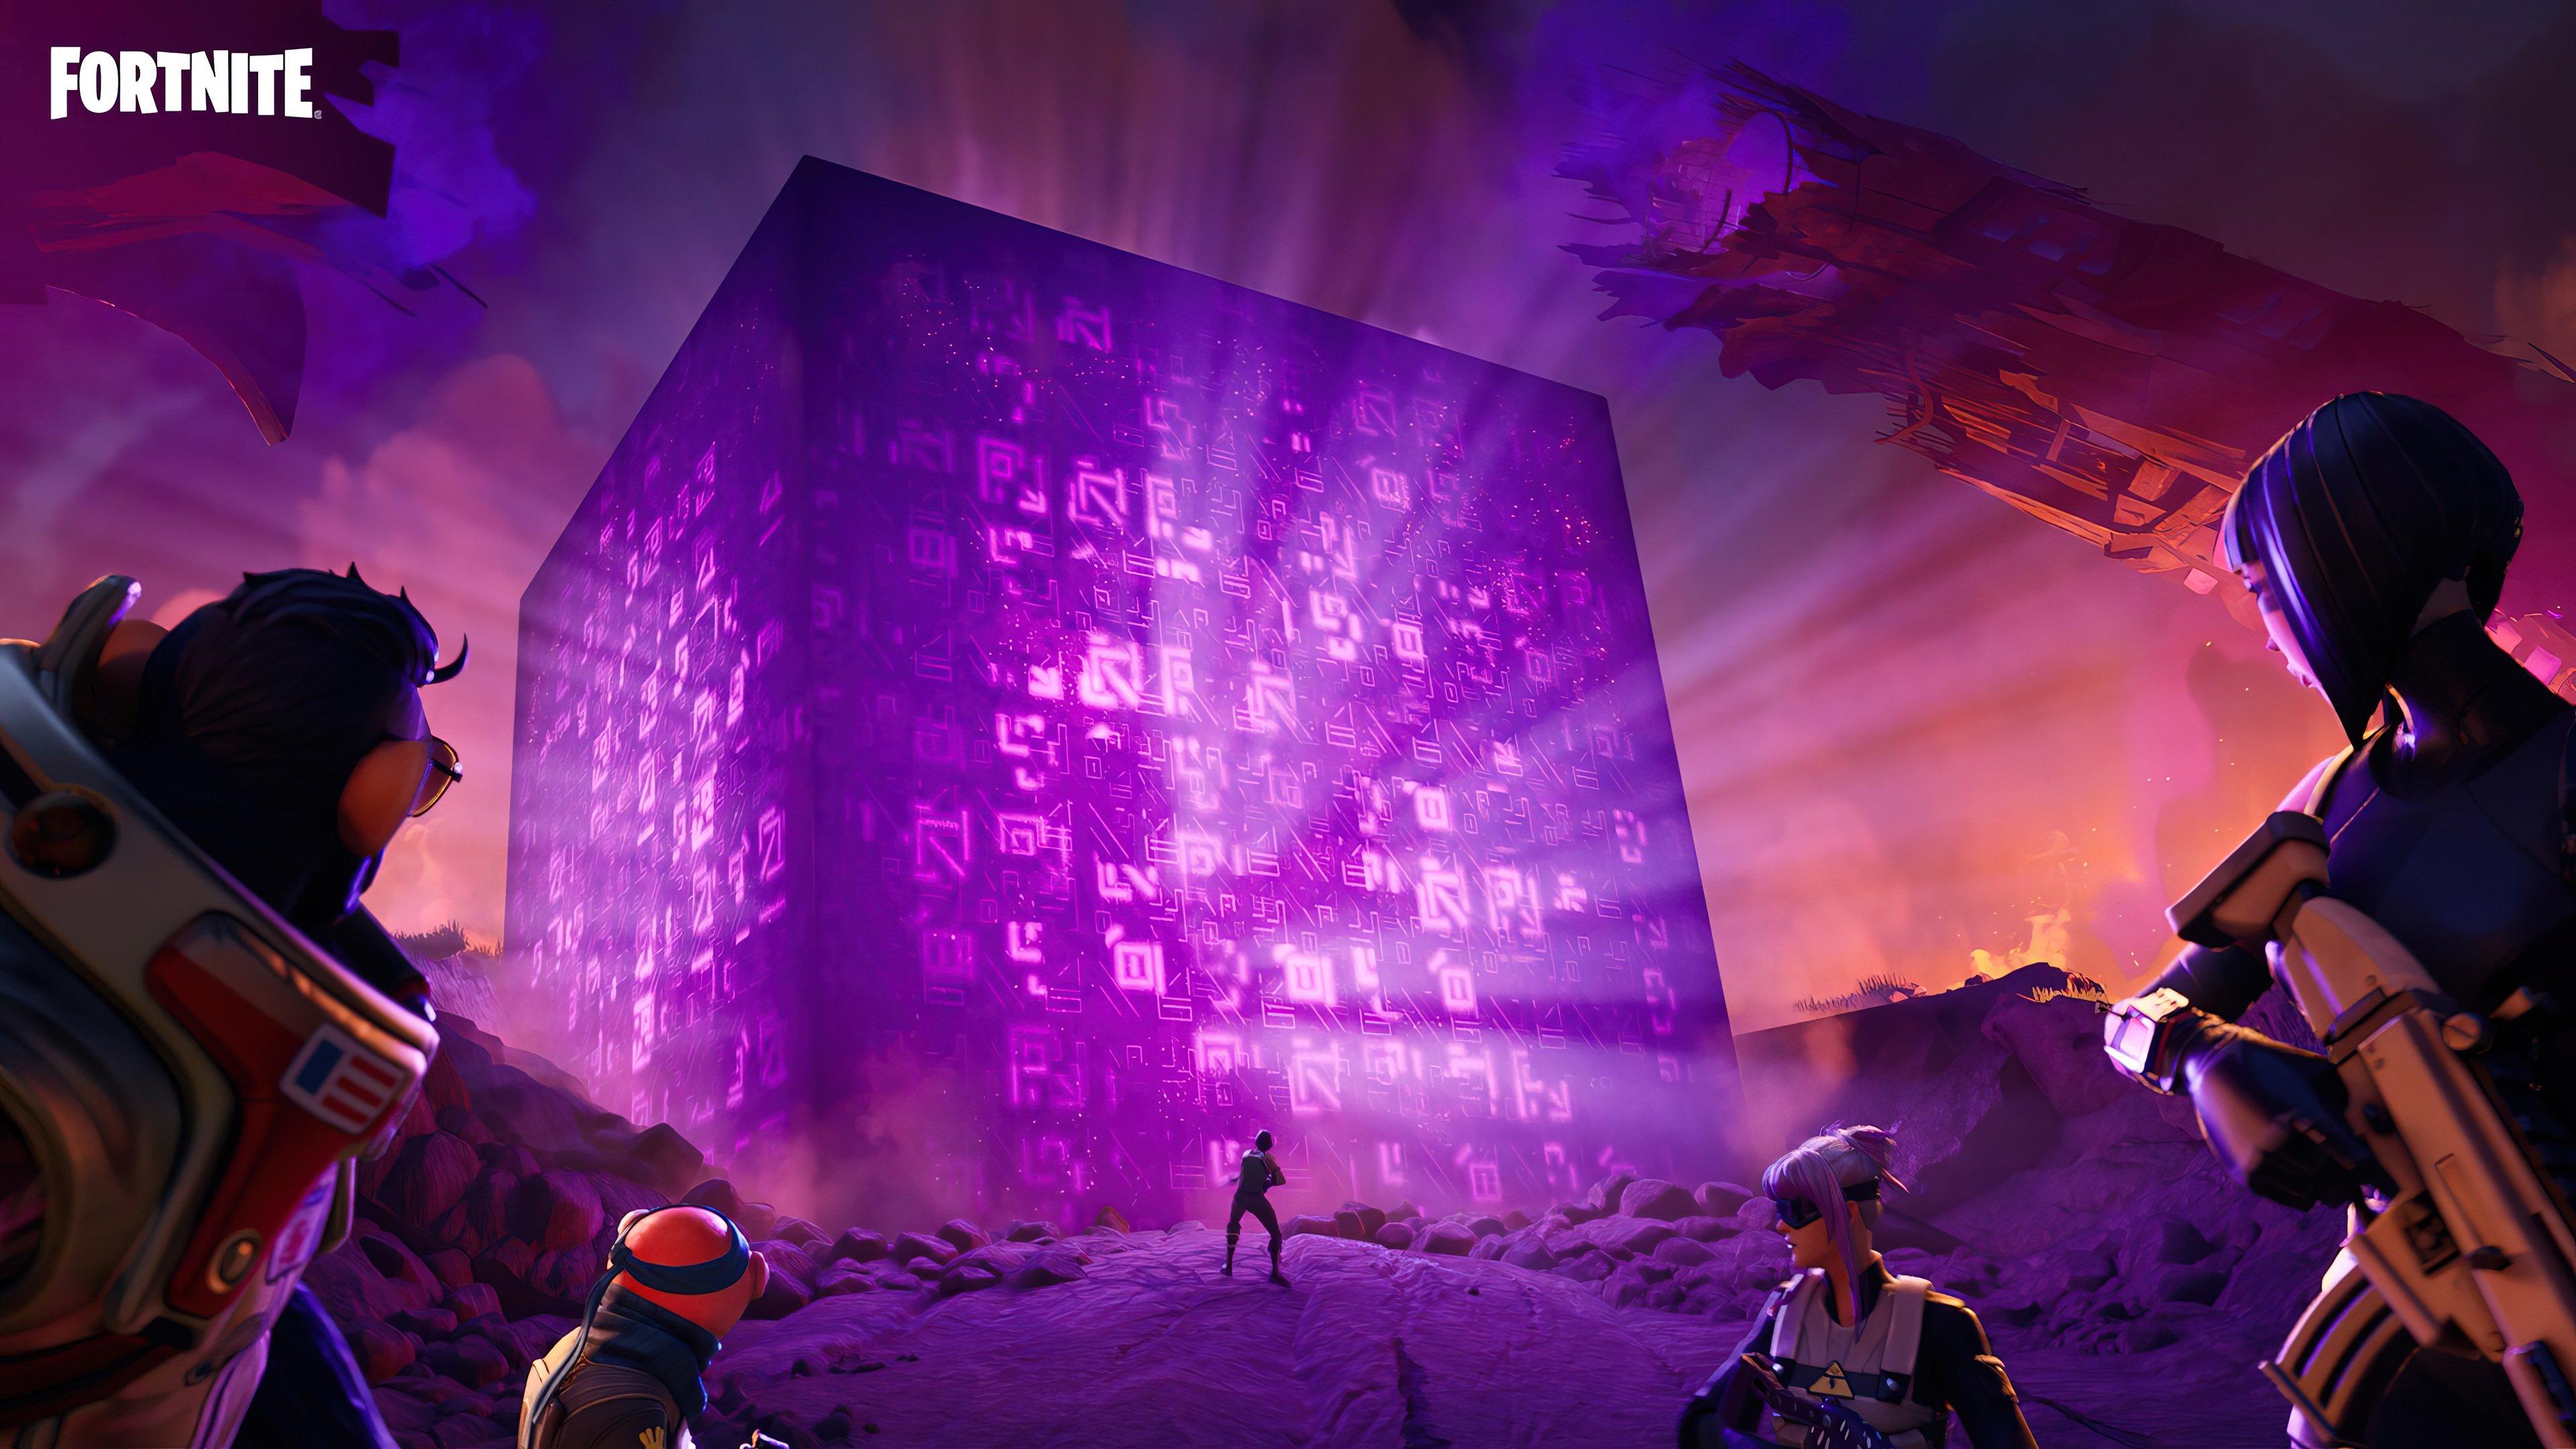 Fondos de pantalla Fortnite Capitulo 2 Temporada